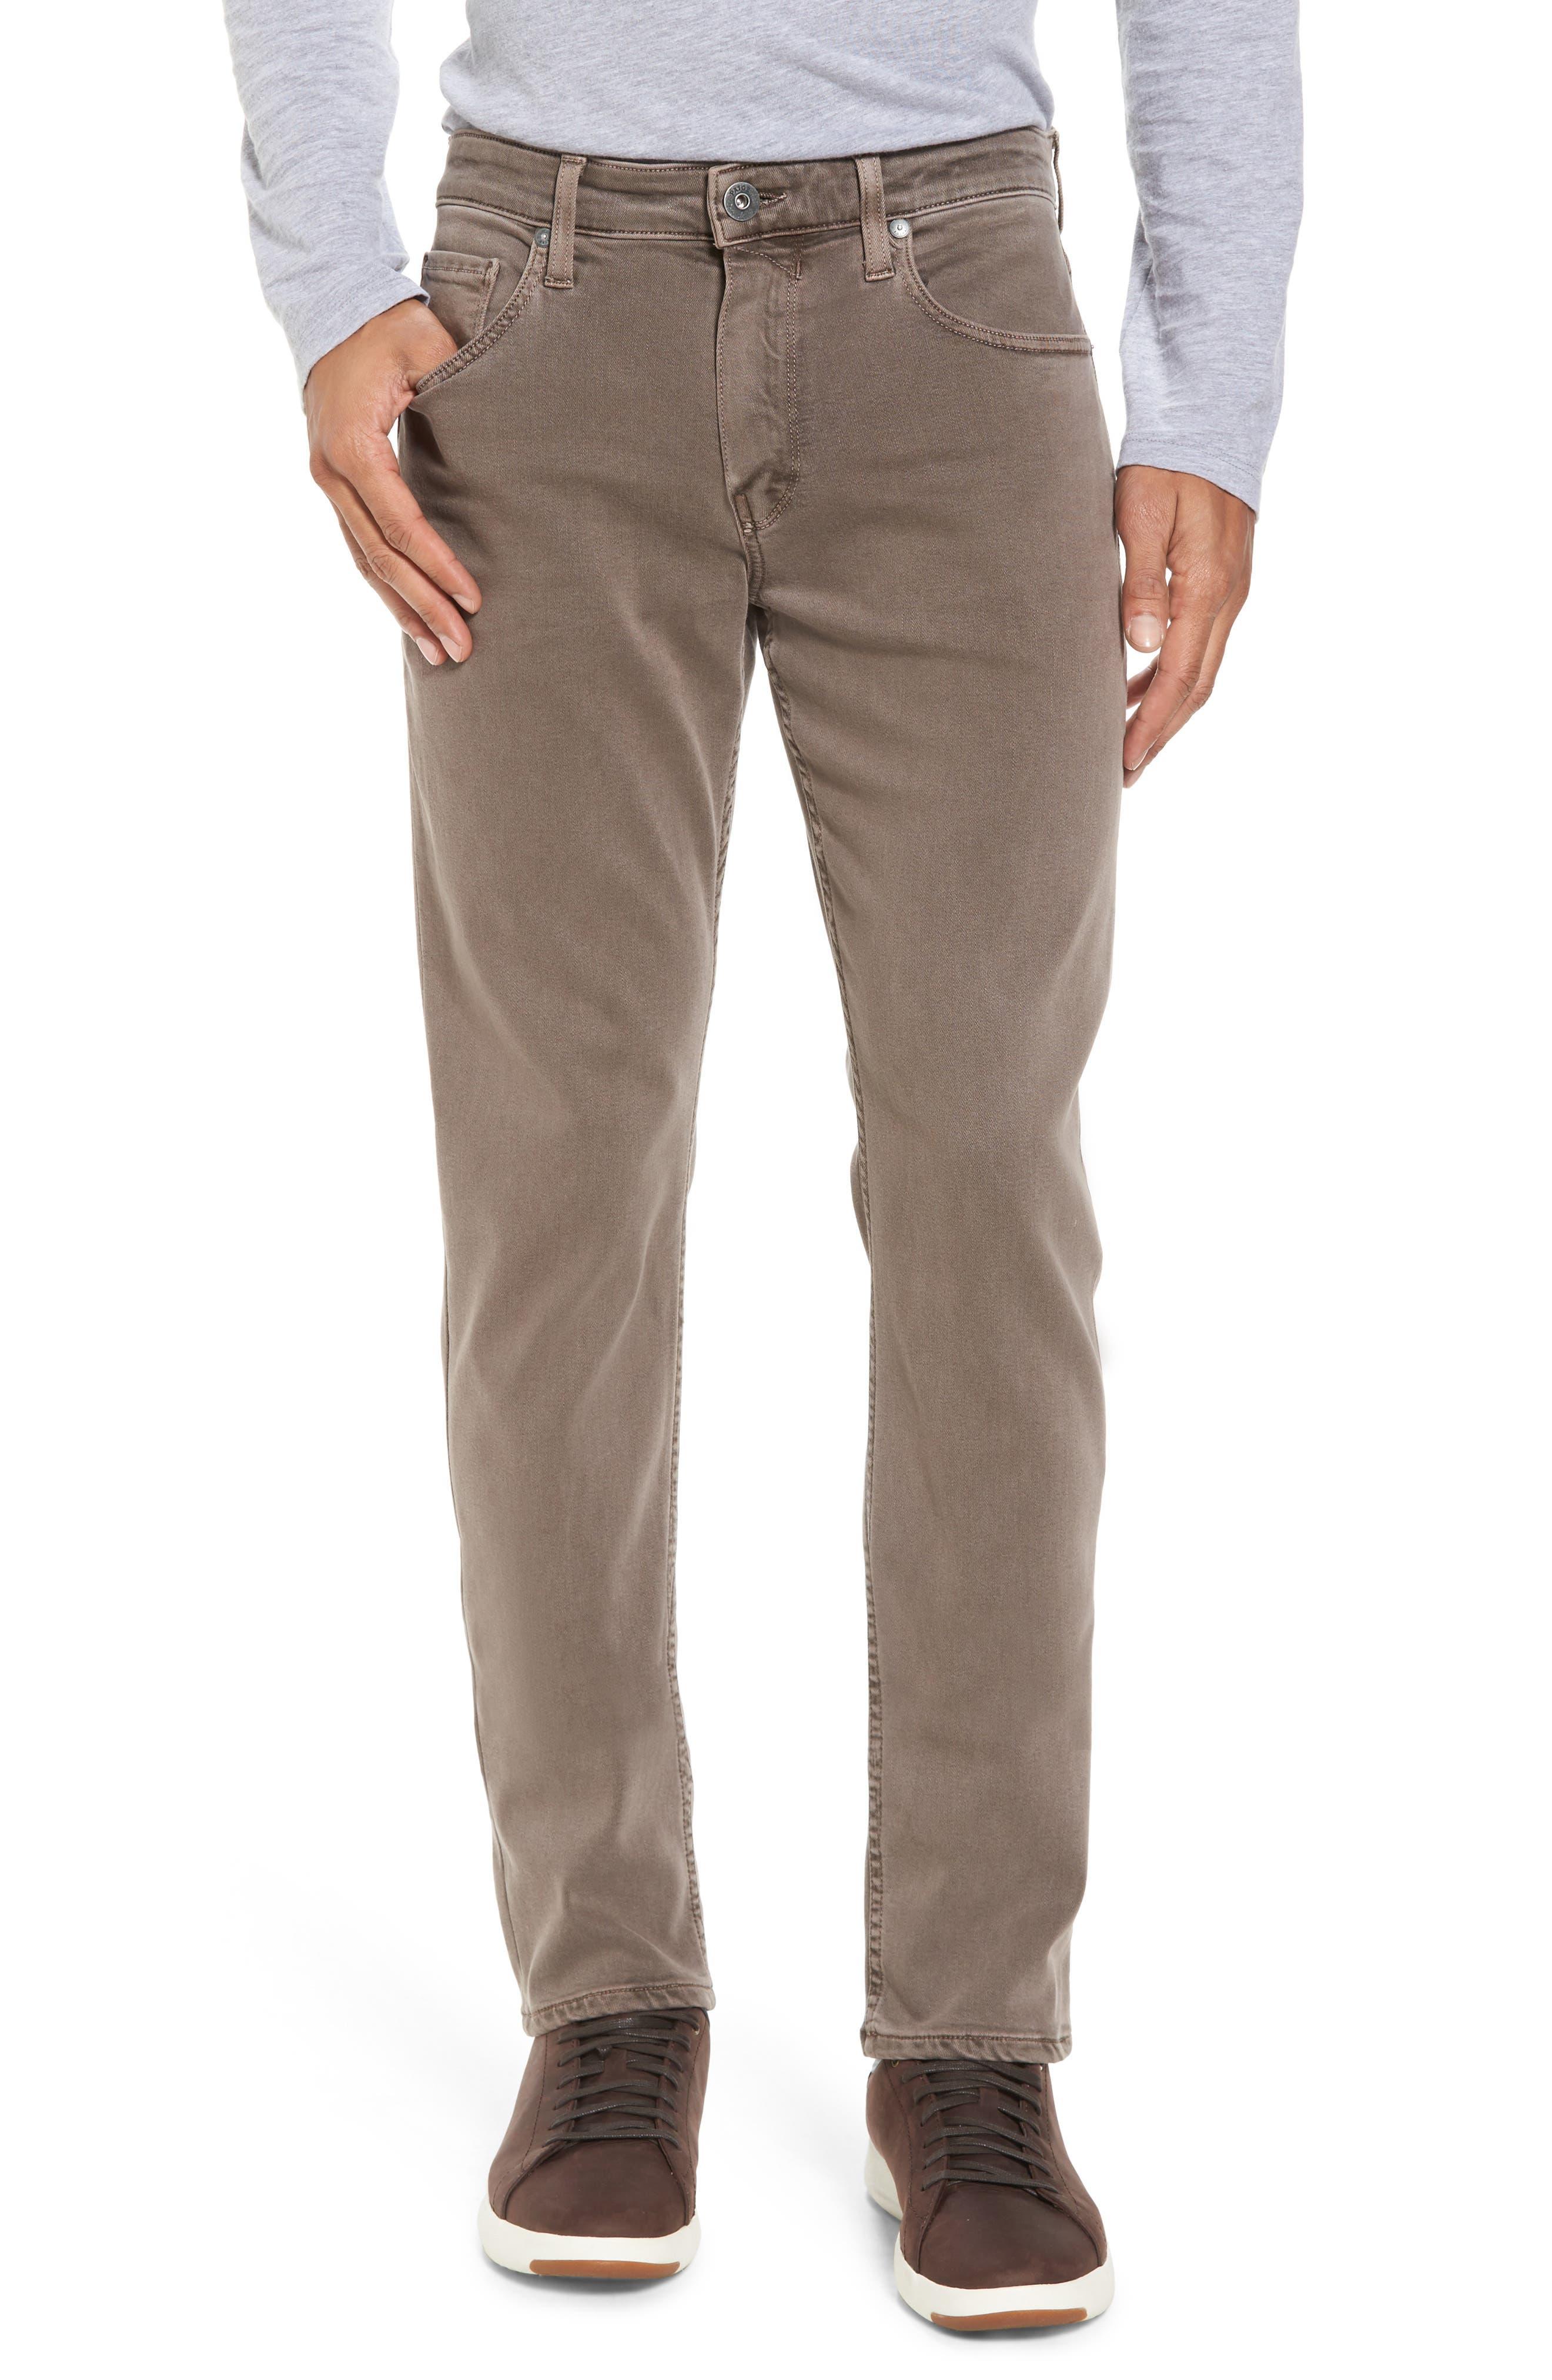 PAIGE Transcend - Federal Slim Straight Fit Jeans (Vintage Sandbar)